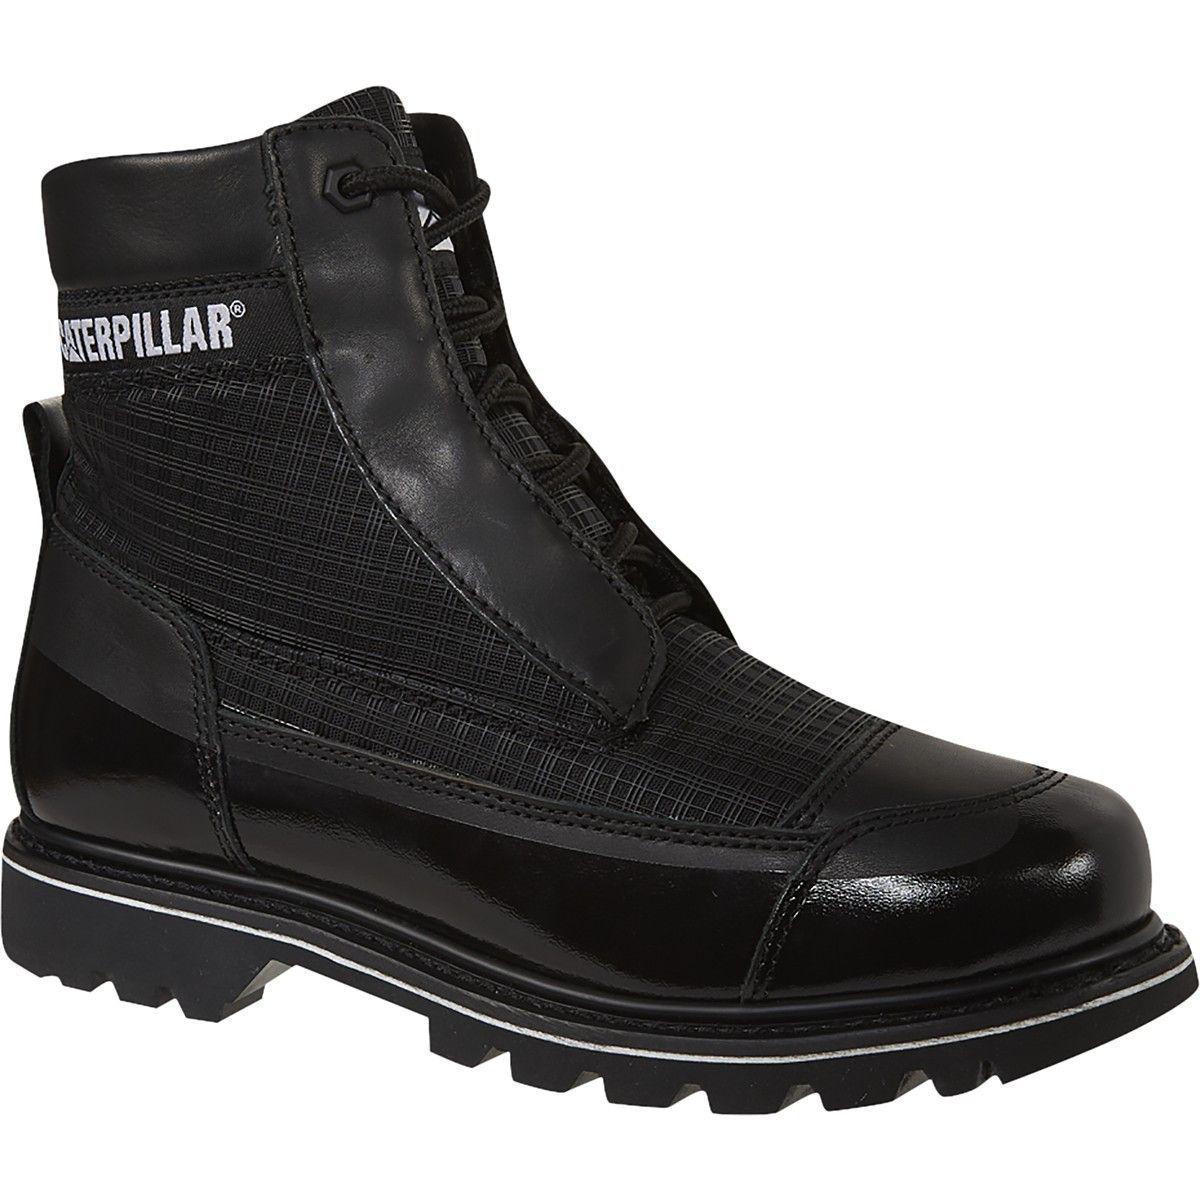 Weldon Chukka Boots by Caterpillar